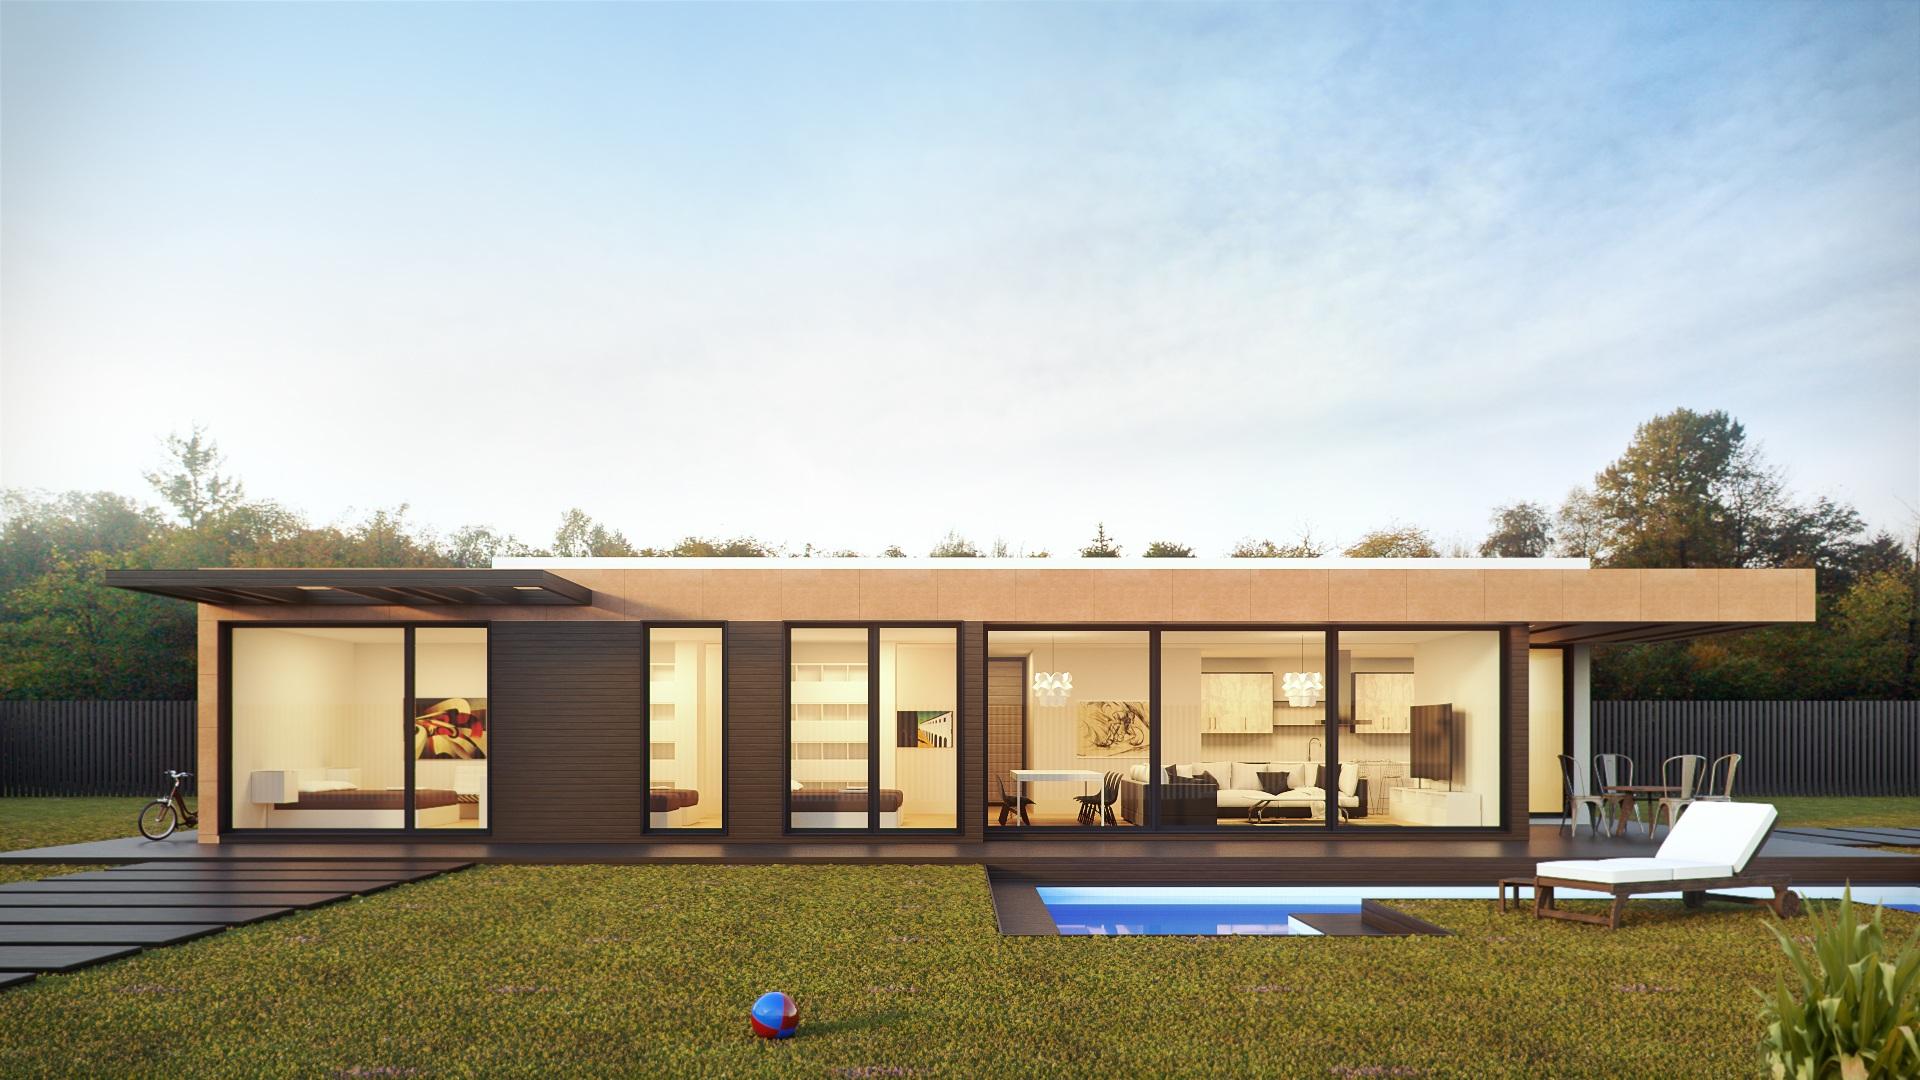 Fotos gratis : arquitectura, villa, piscina, fachada, propiedad ...